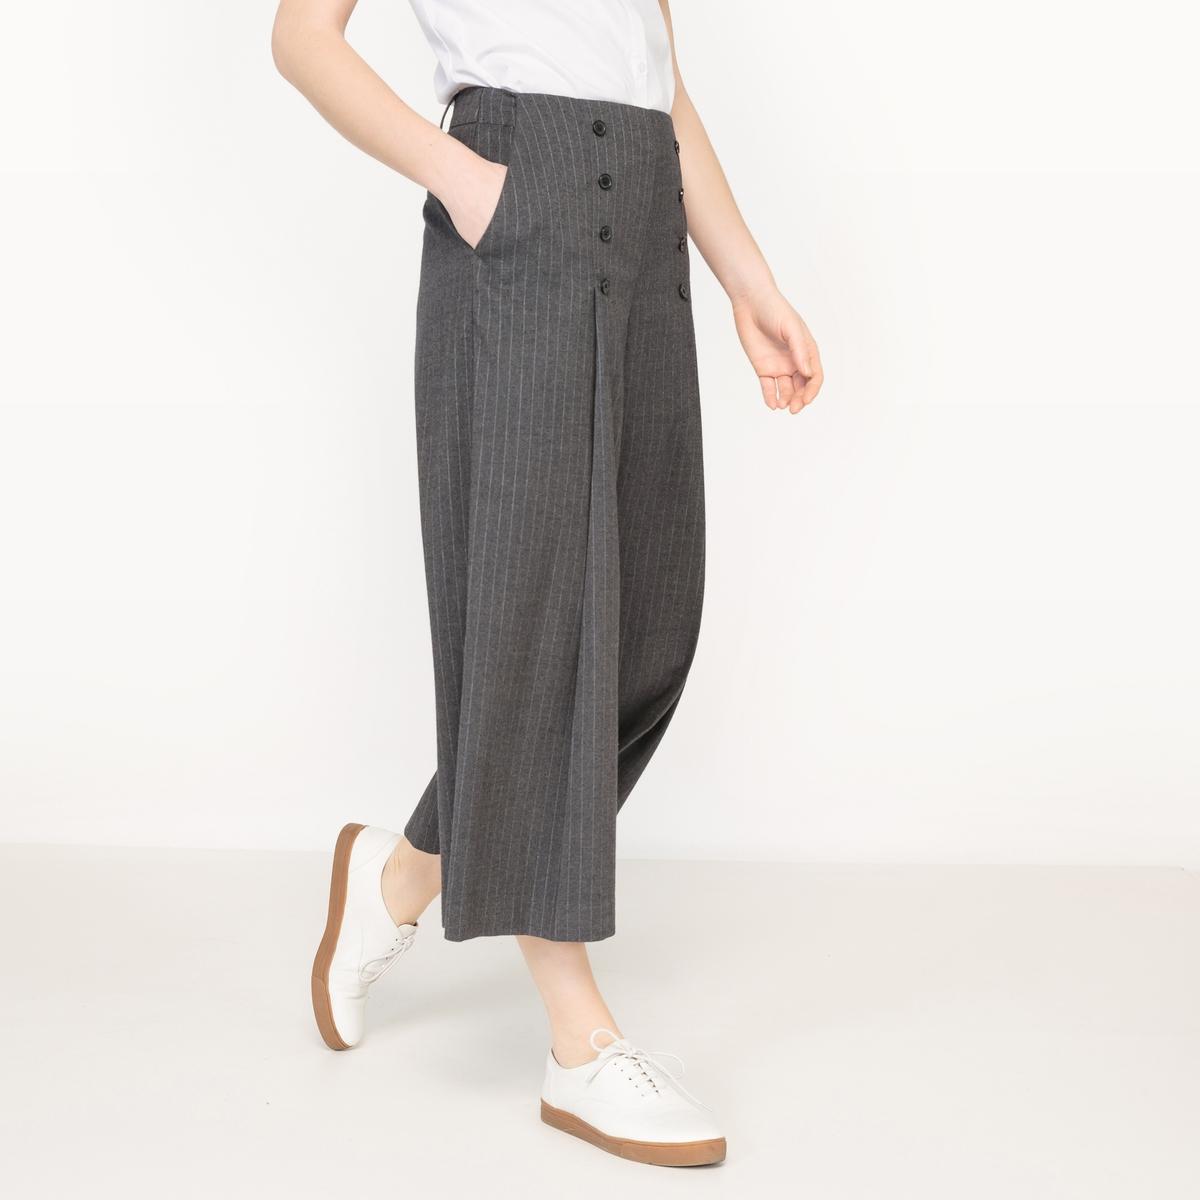 Юбка-брюки в тонкую полоску от La Redoute